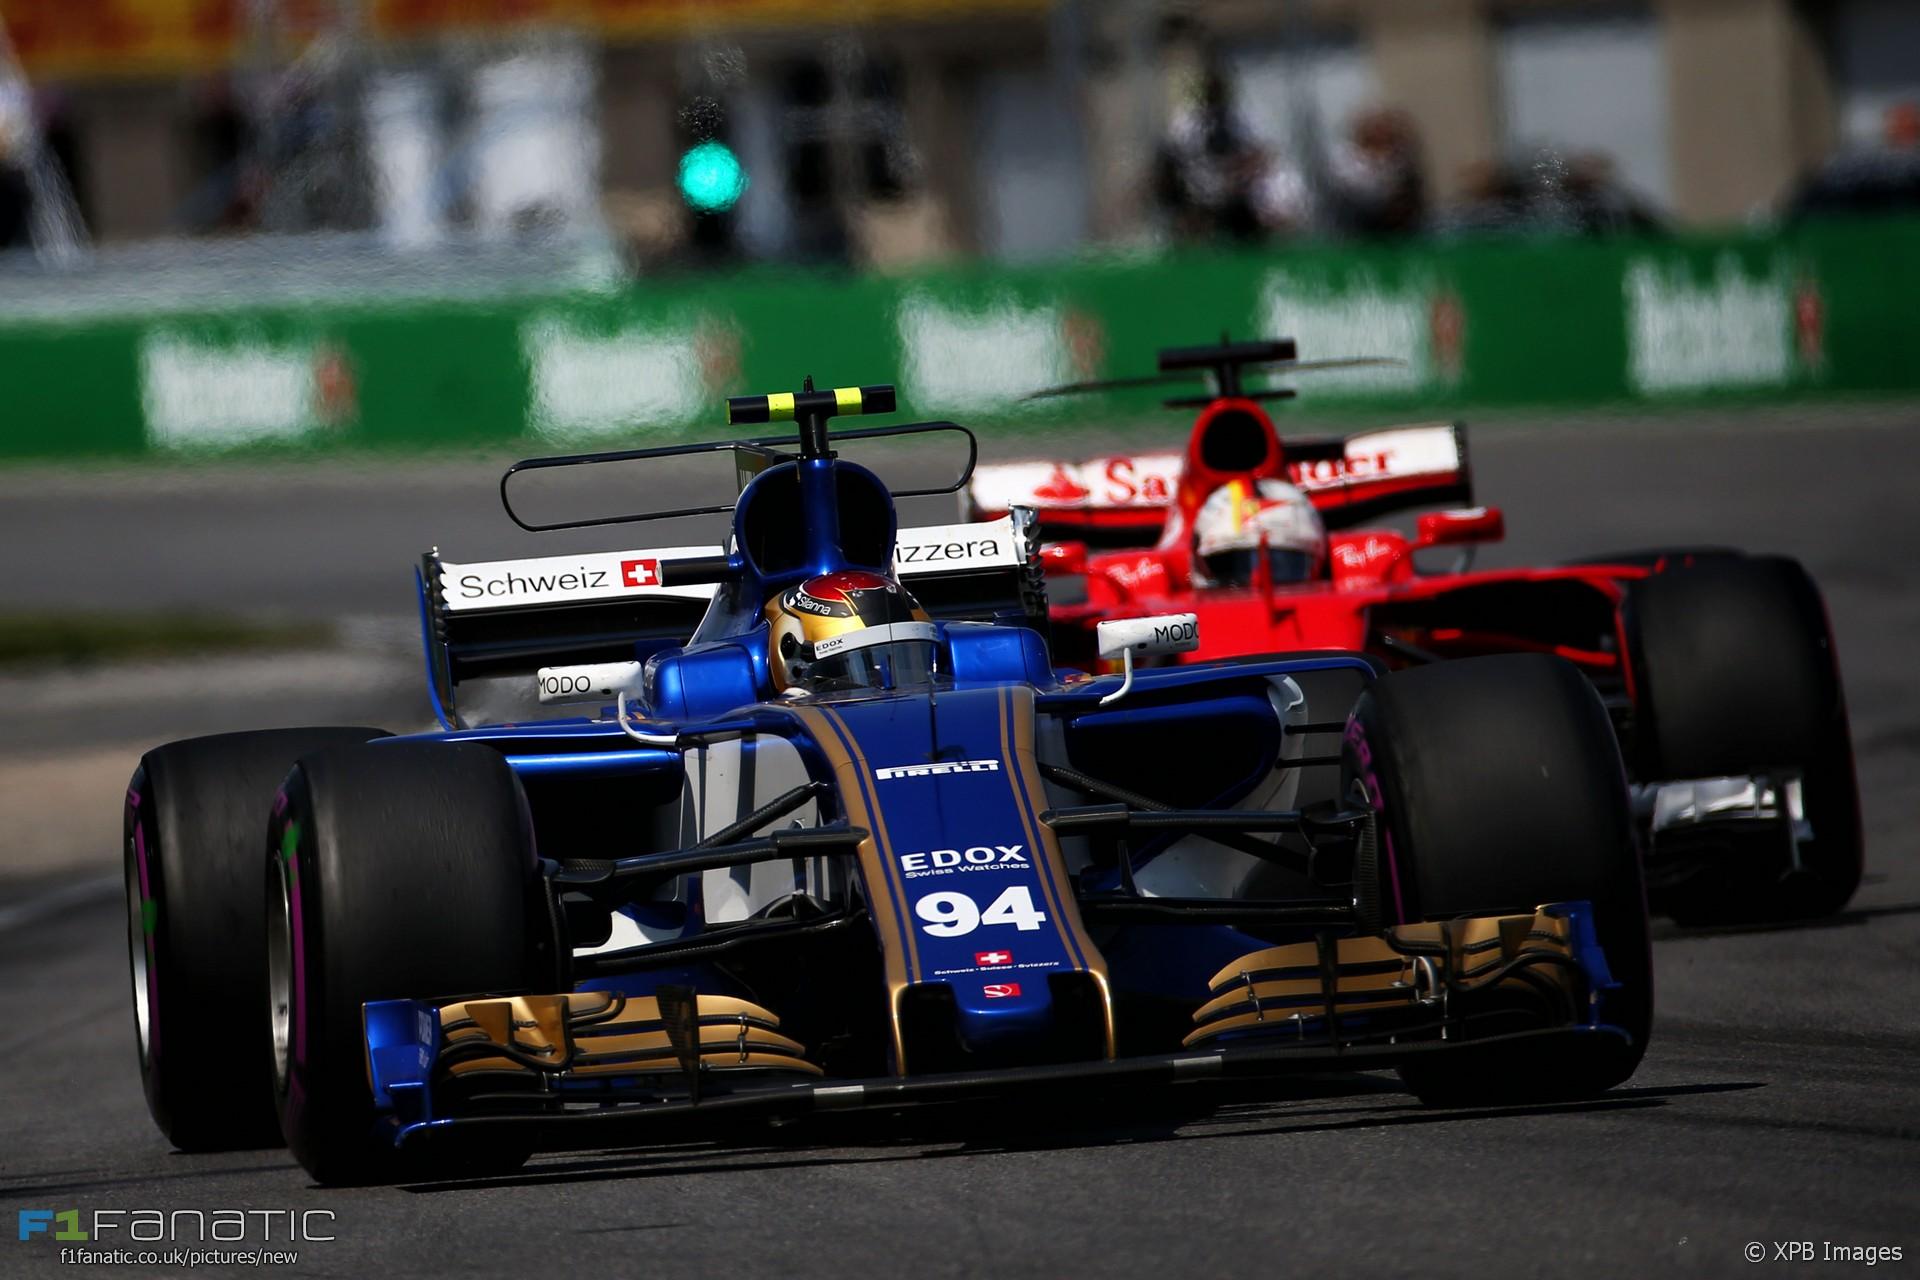 Pascal Wehrlein, Sauber, Circuit Gilles Villeneuve, 2017